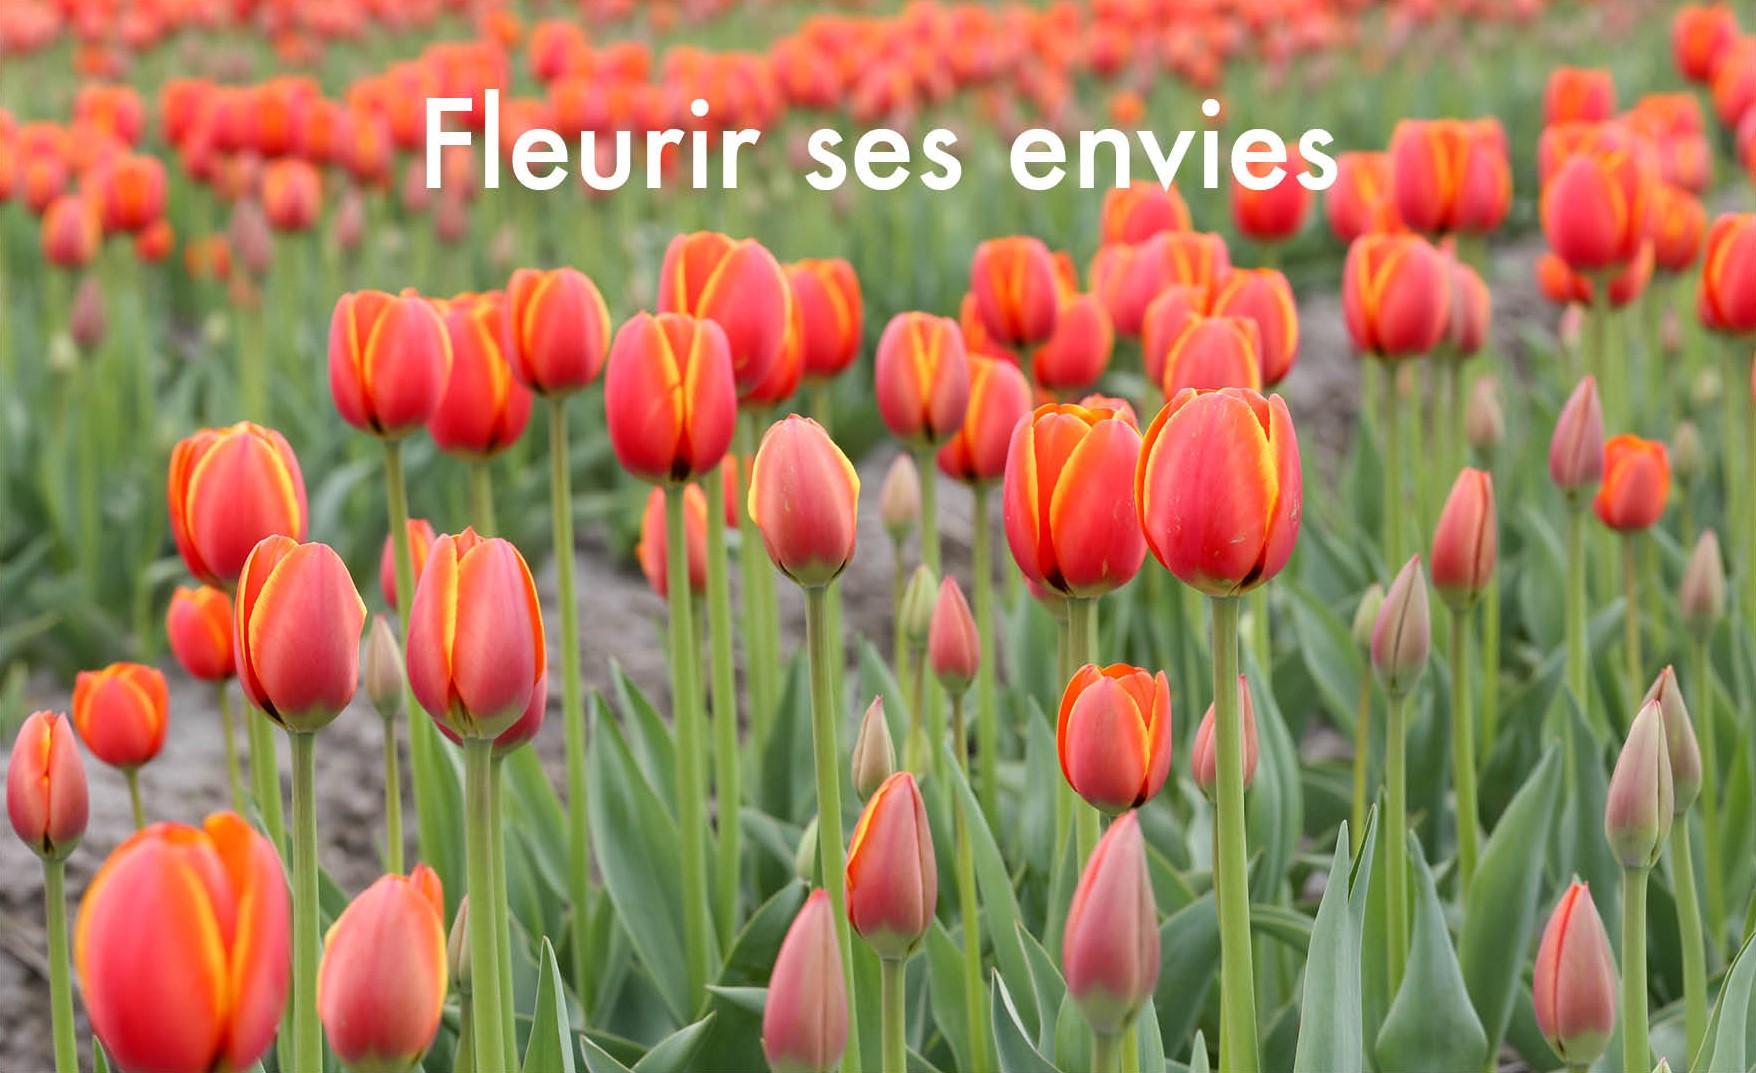 poster-tulipes-fleurir-ses-envies-2